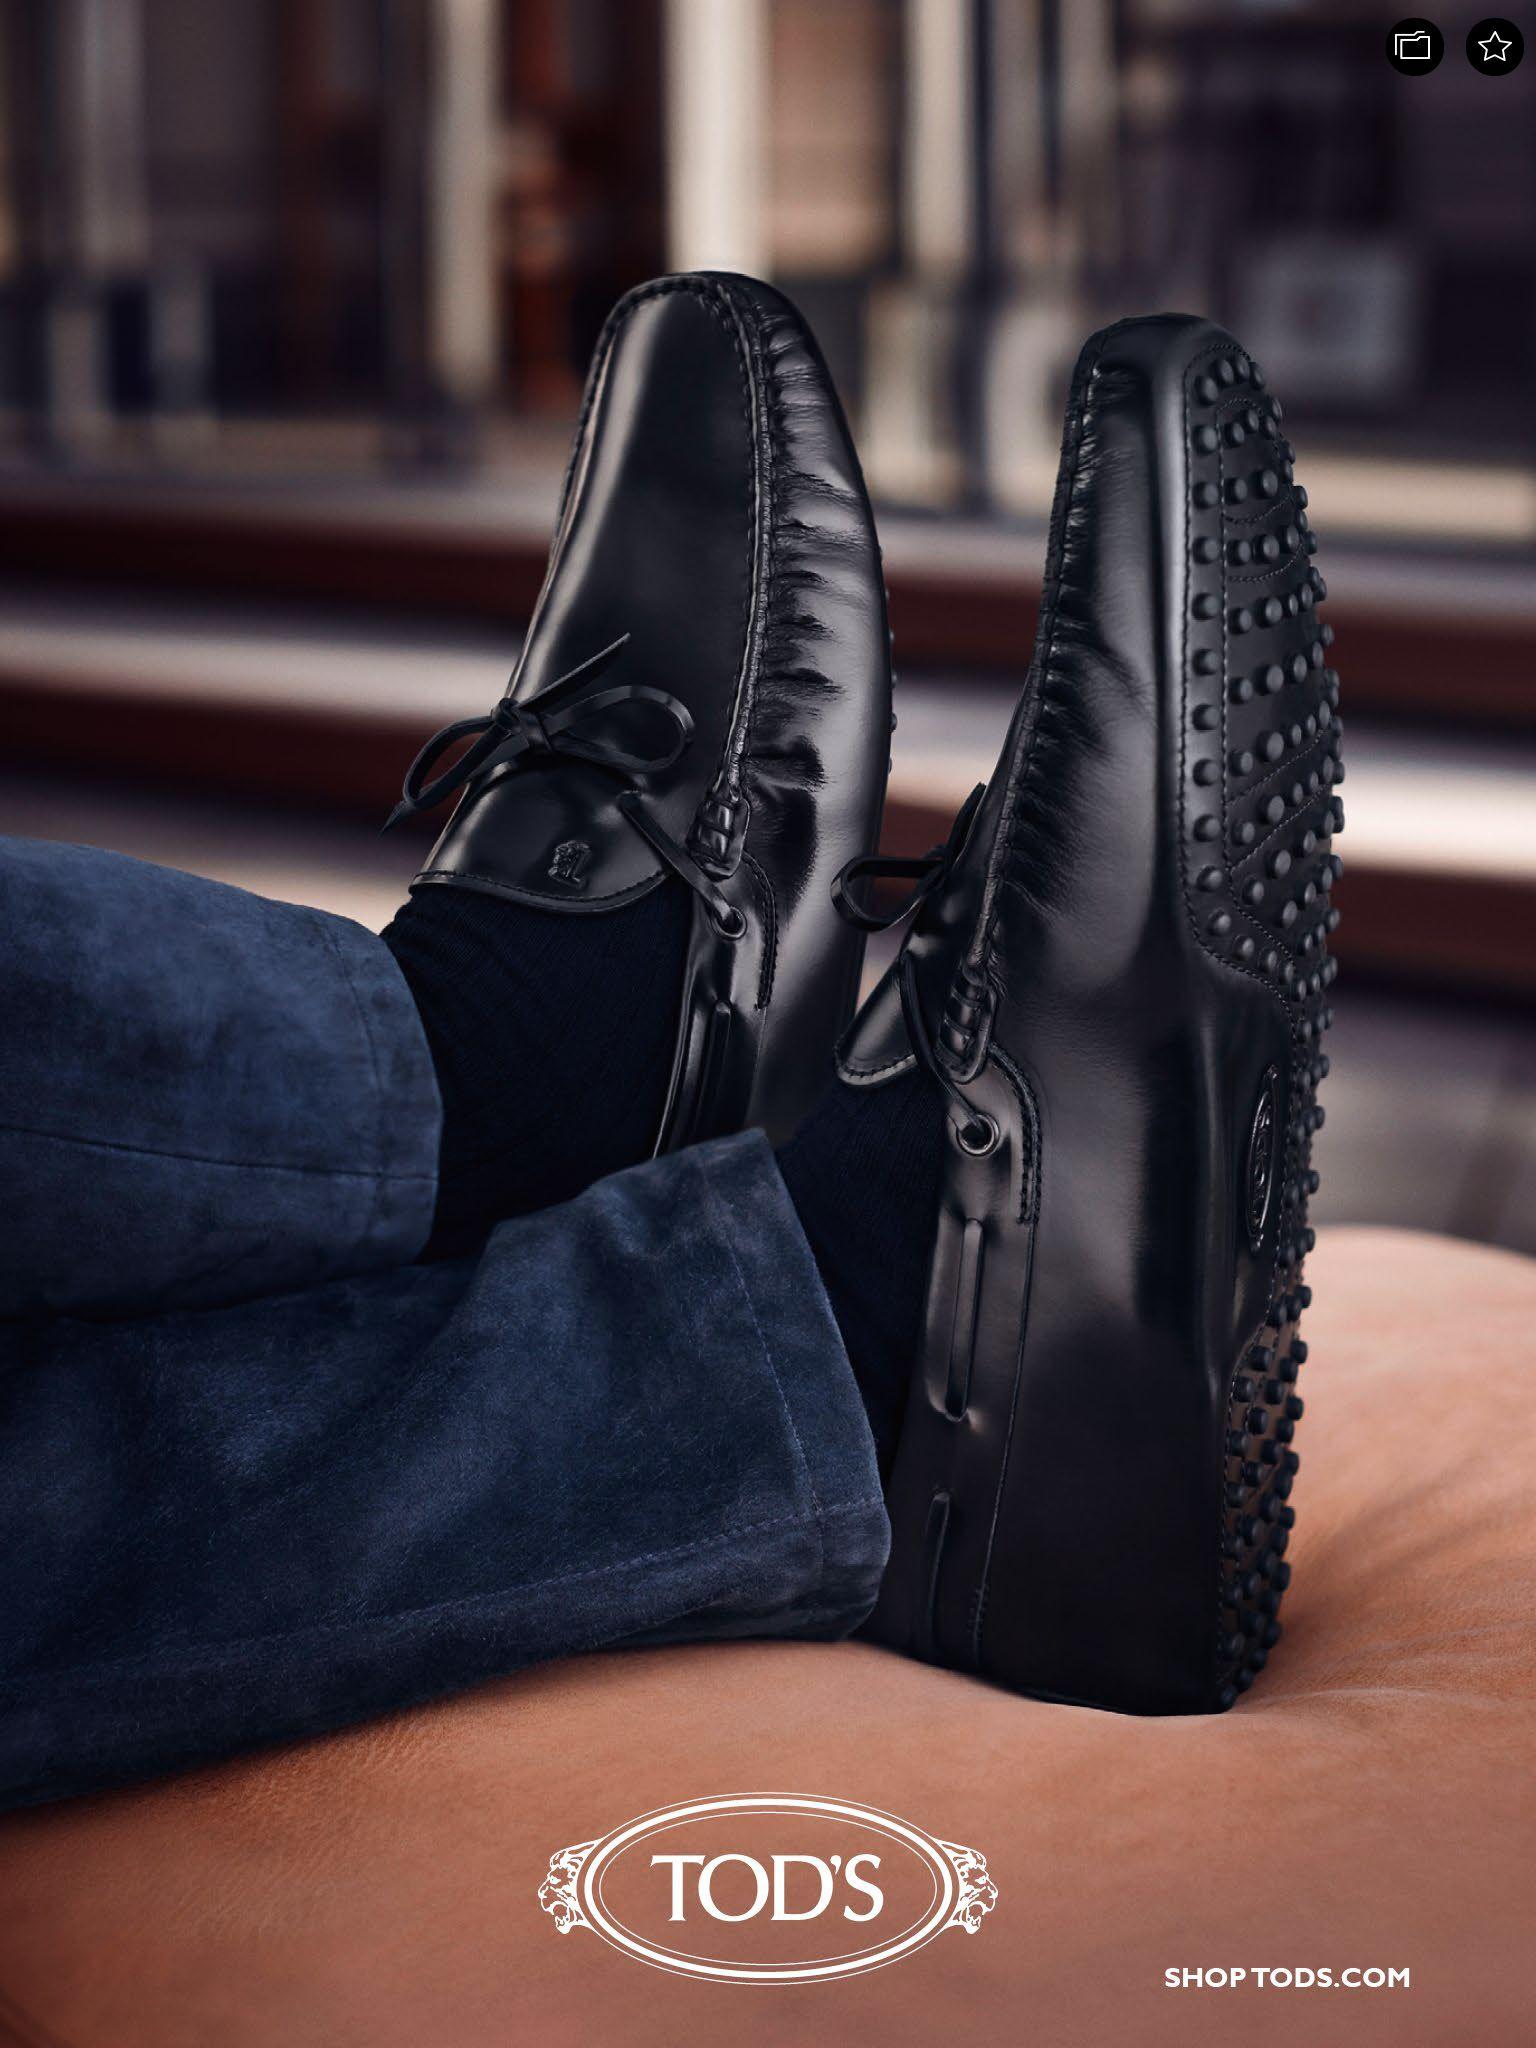 Tods Mens Shoes | Driving shoes men